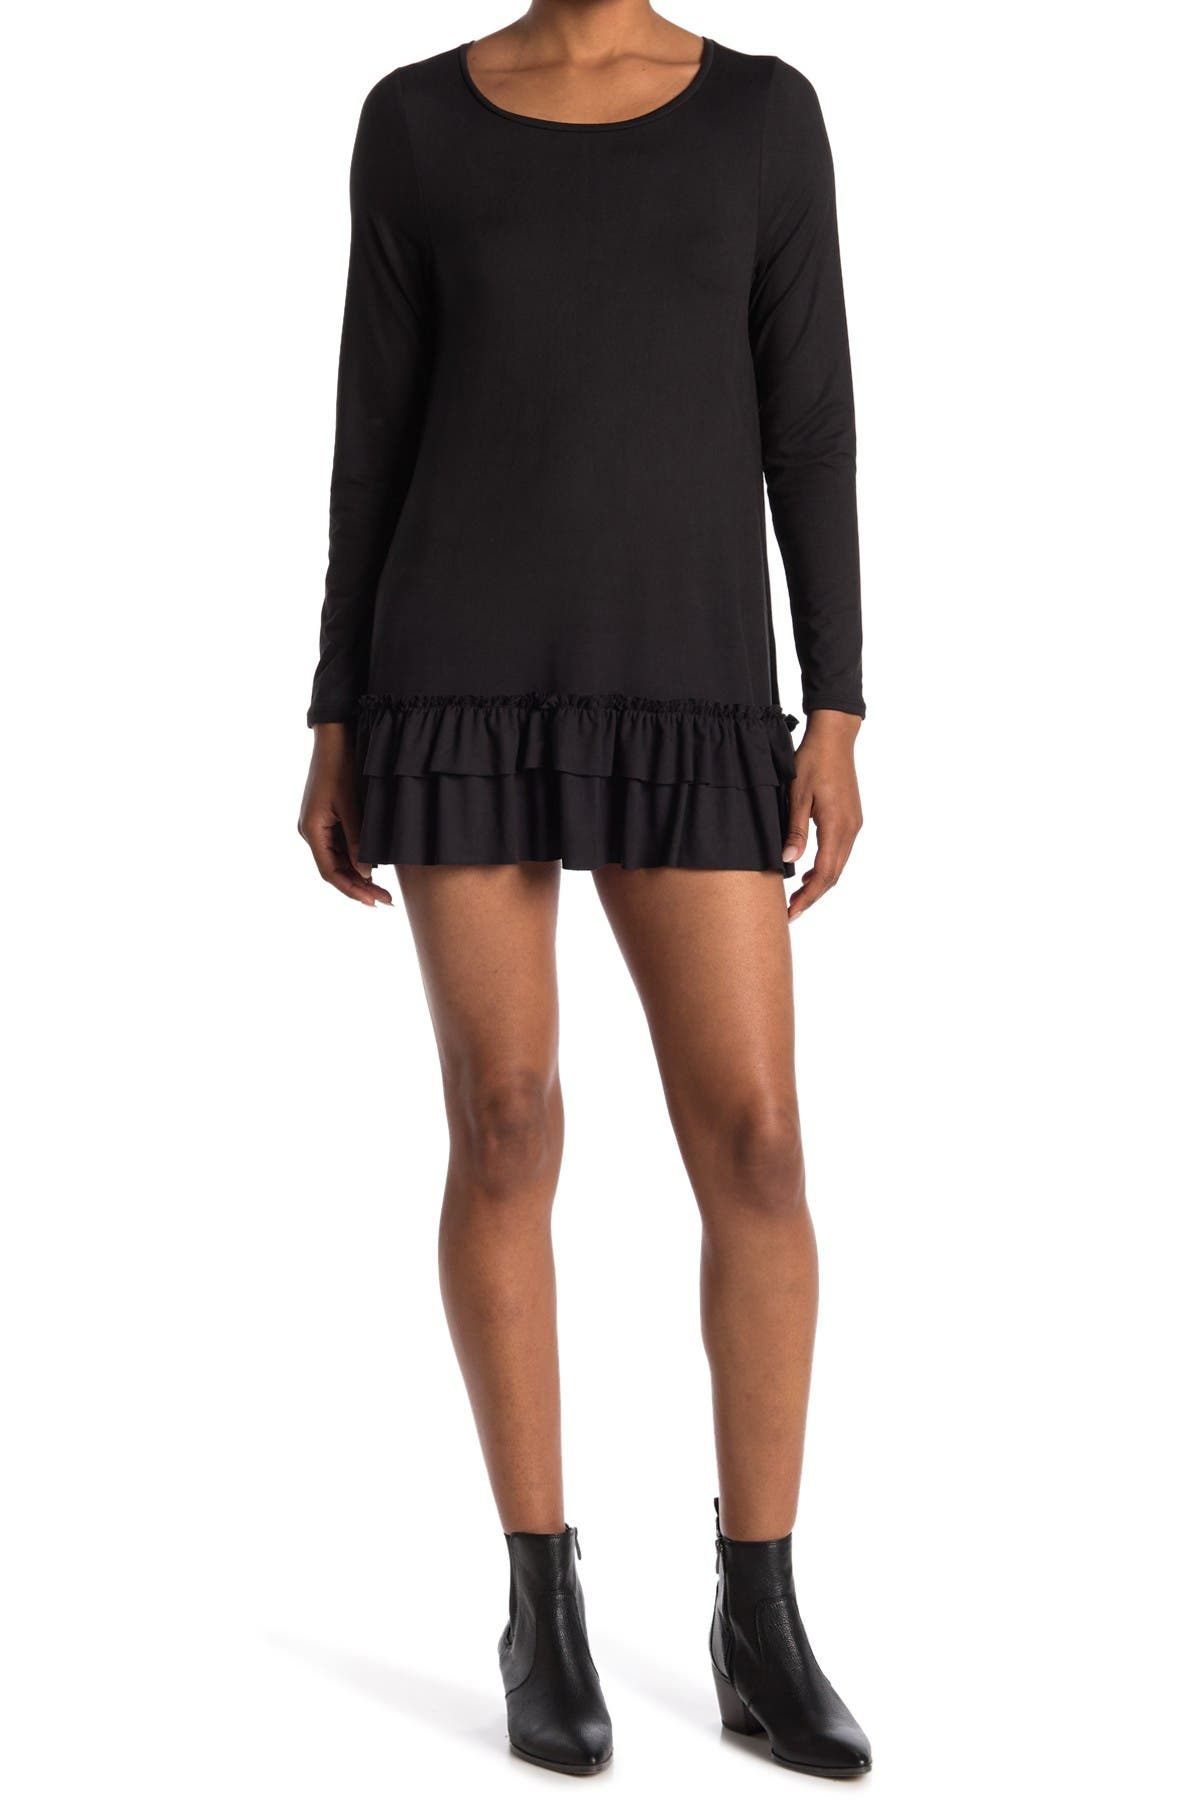 Image of Velvet Torch Long Sleeve Ruffle Knit Tunic